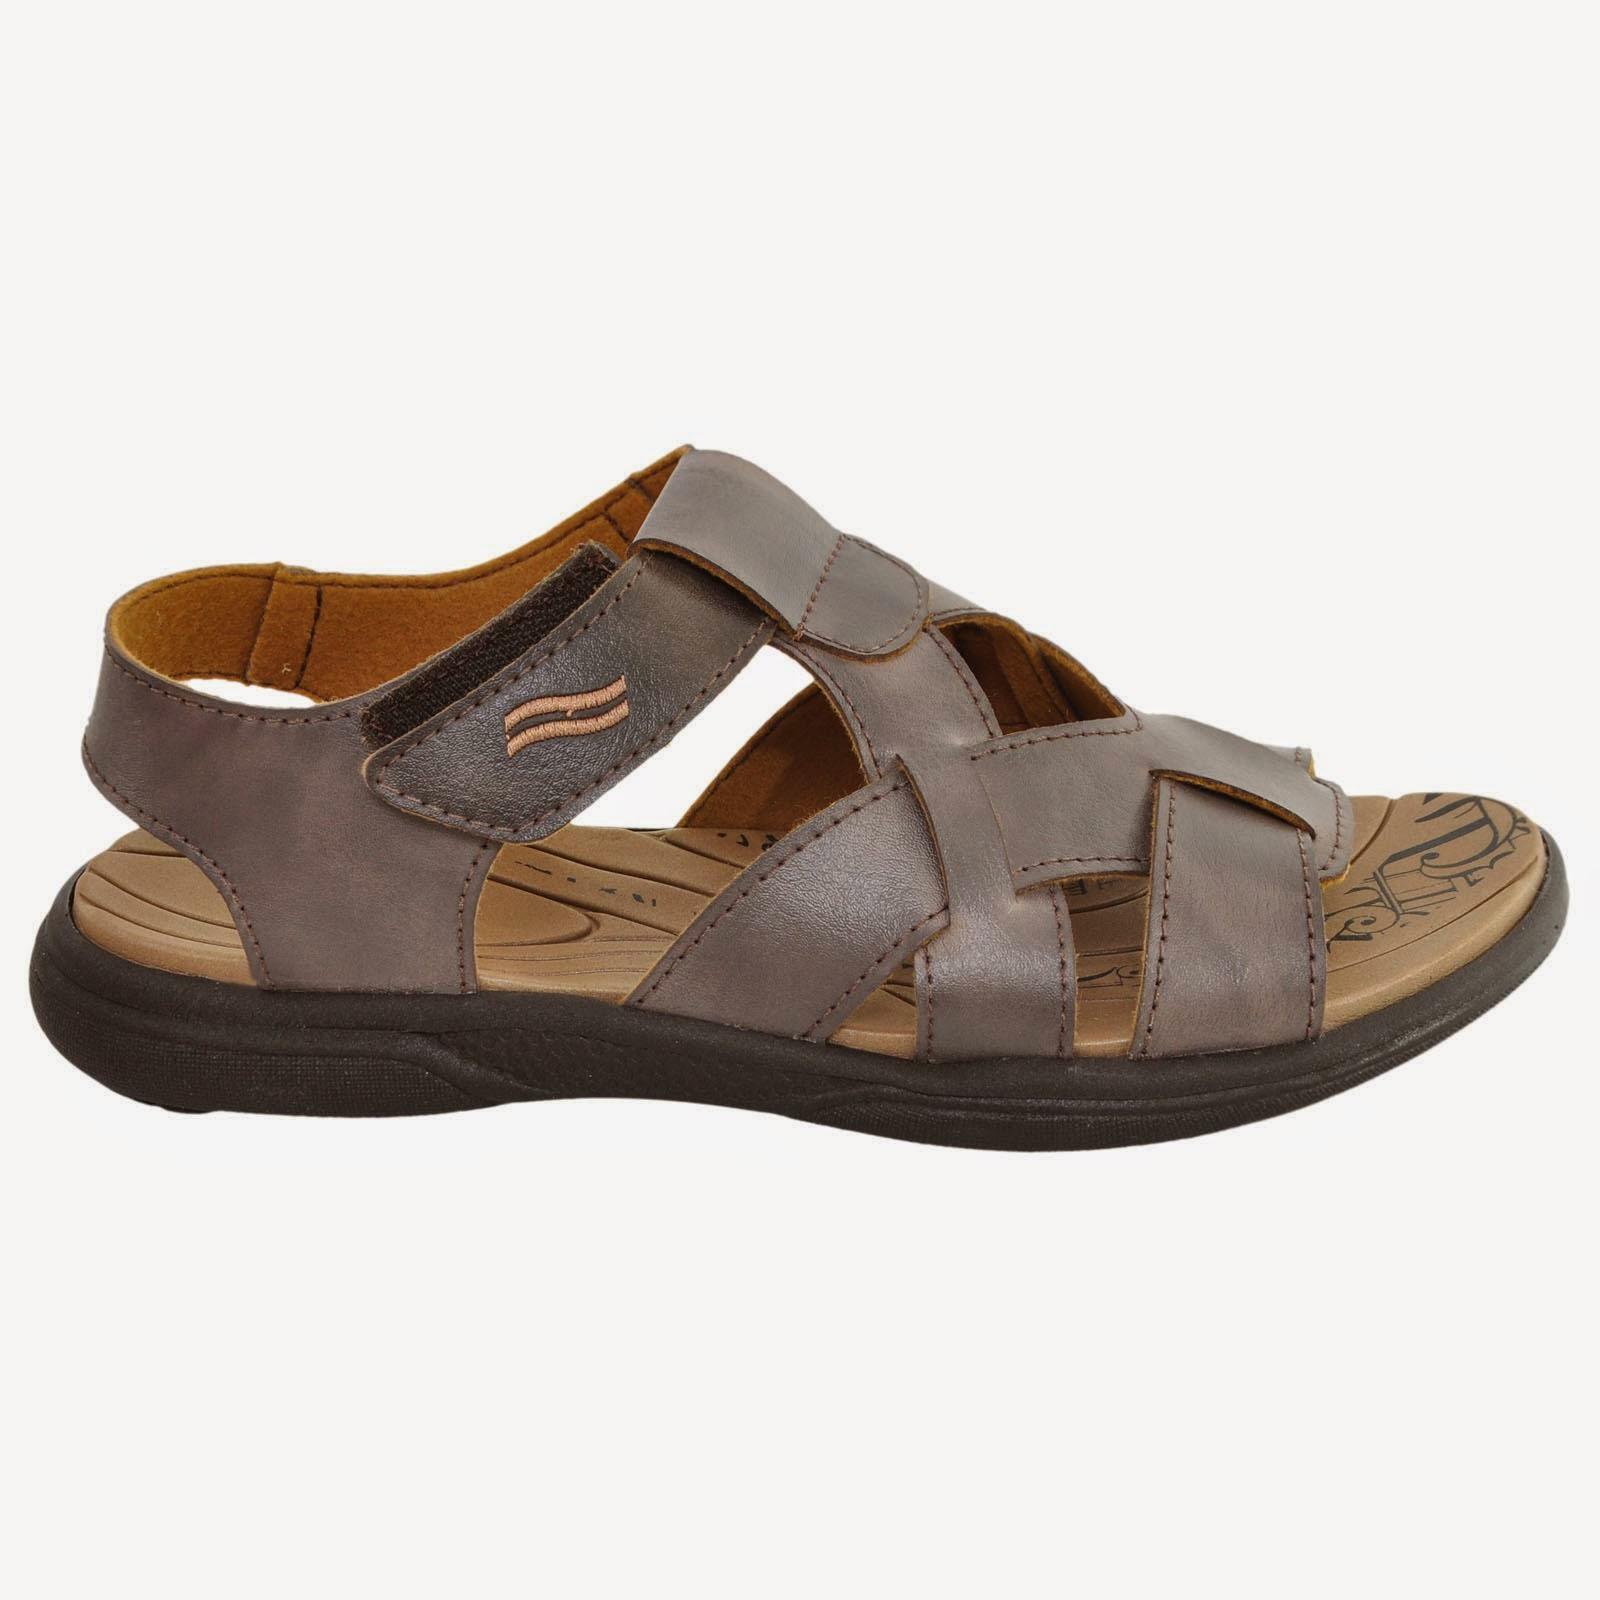 Sandália masculina Itapuã - Sandália de macho